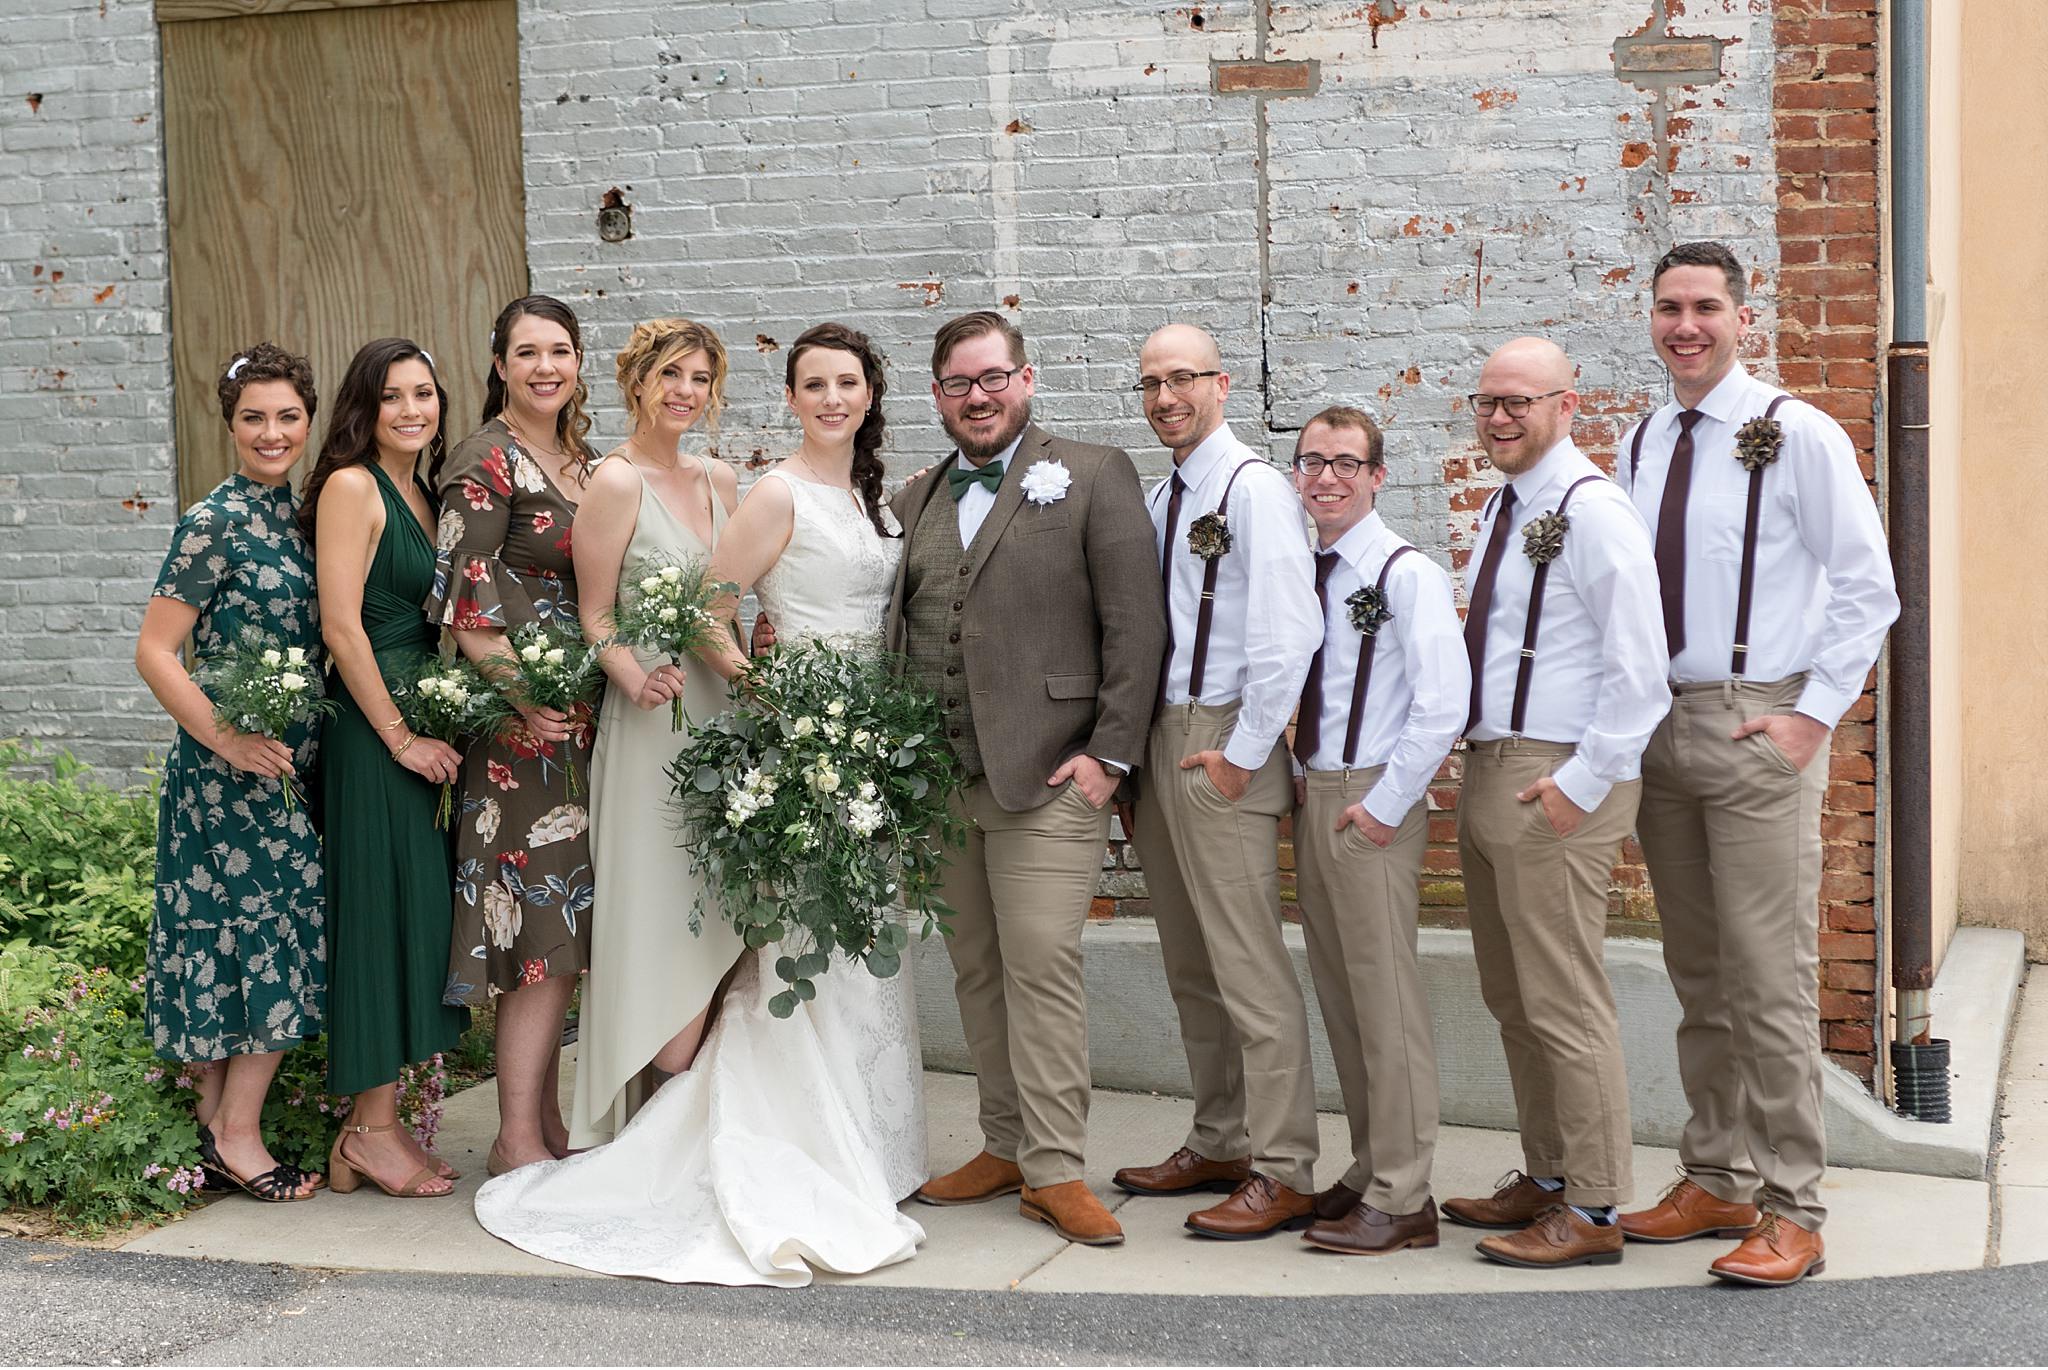 Commonwealth on Queen Lancaster City Wedding Photography_3441.jpg